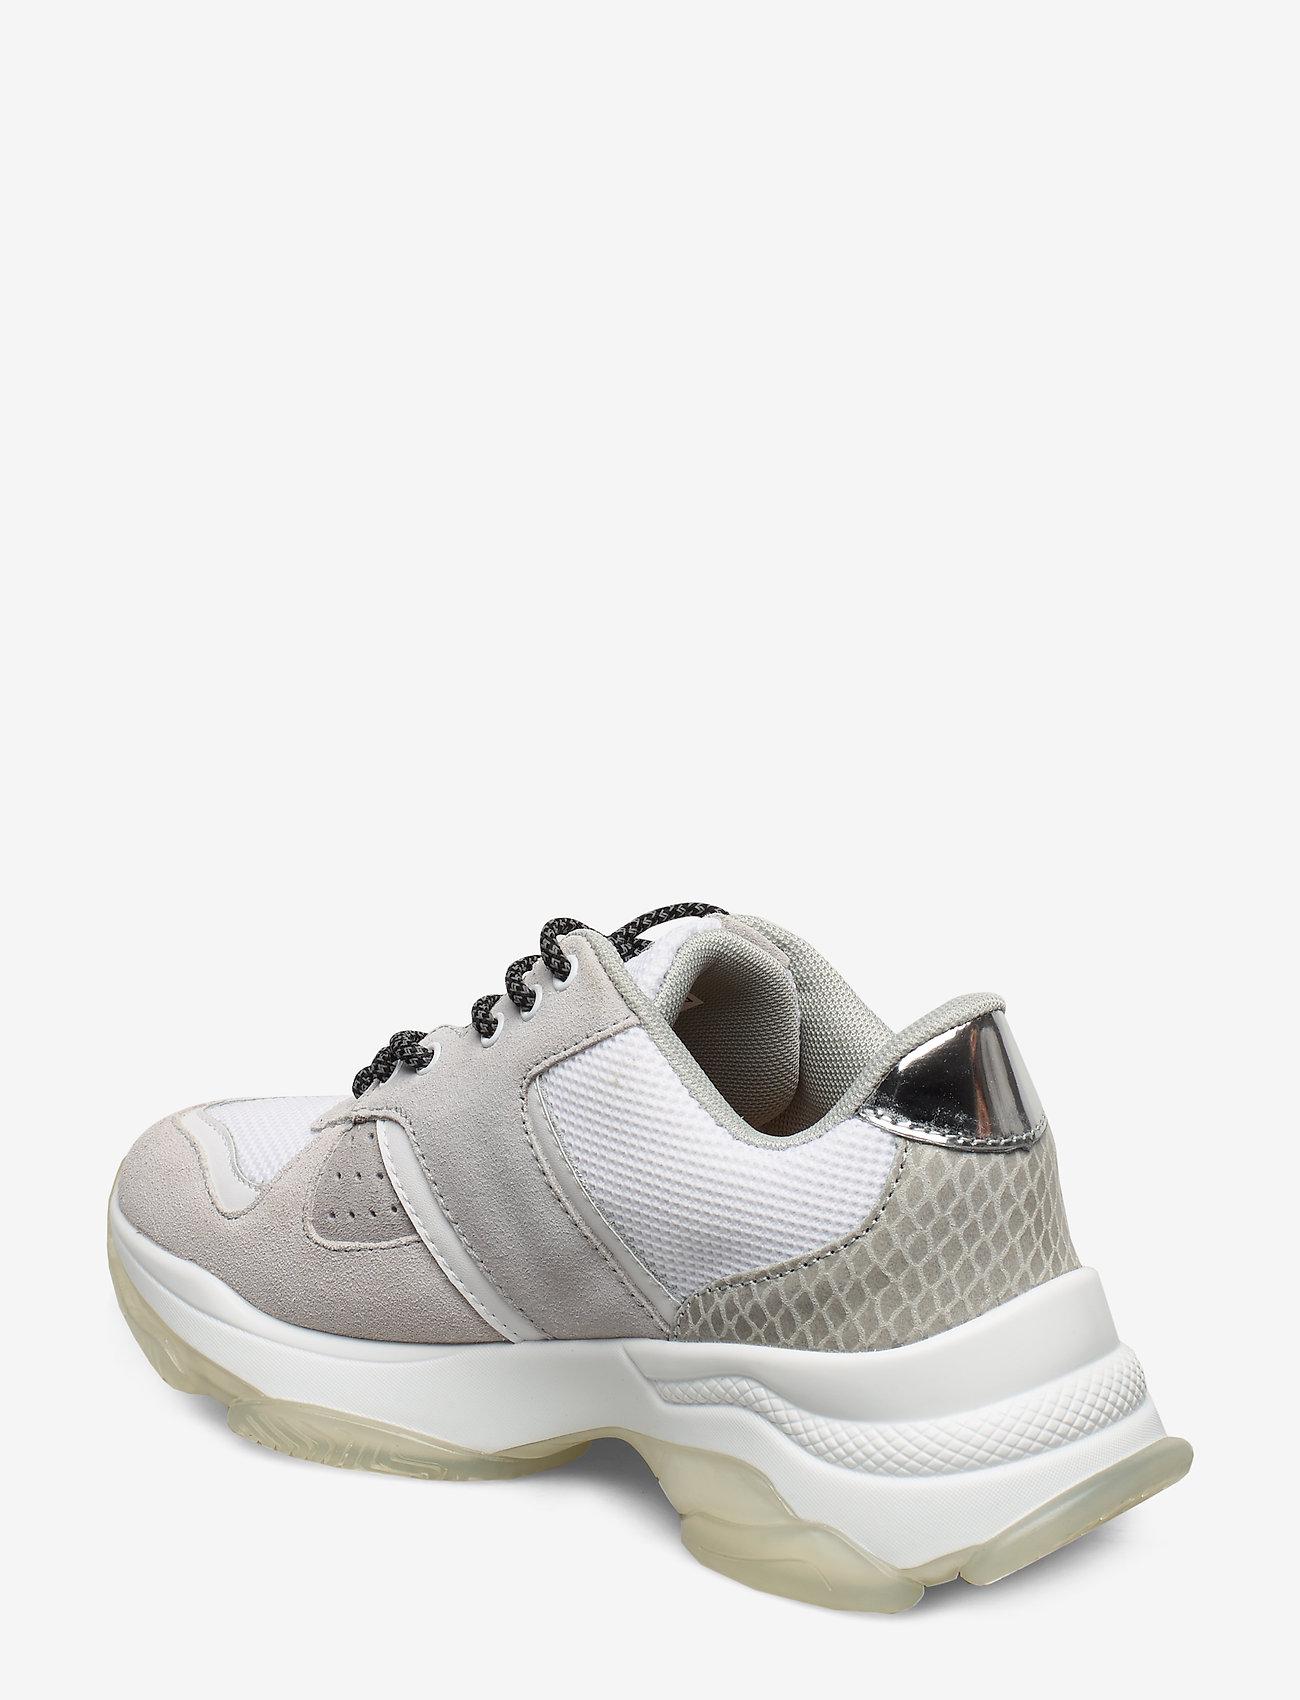 Stb-romina Sneaker (White) - Shoe The Bear